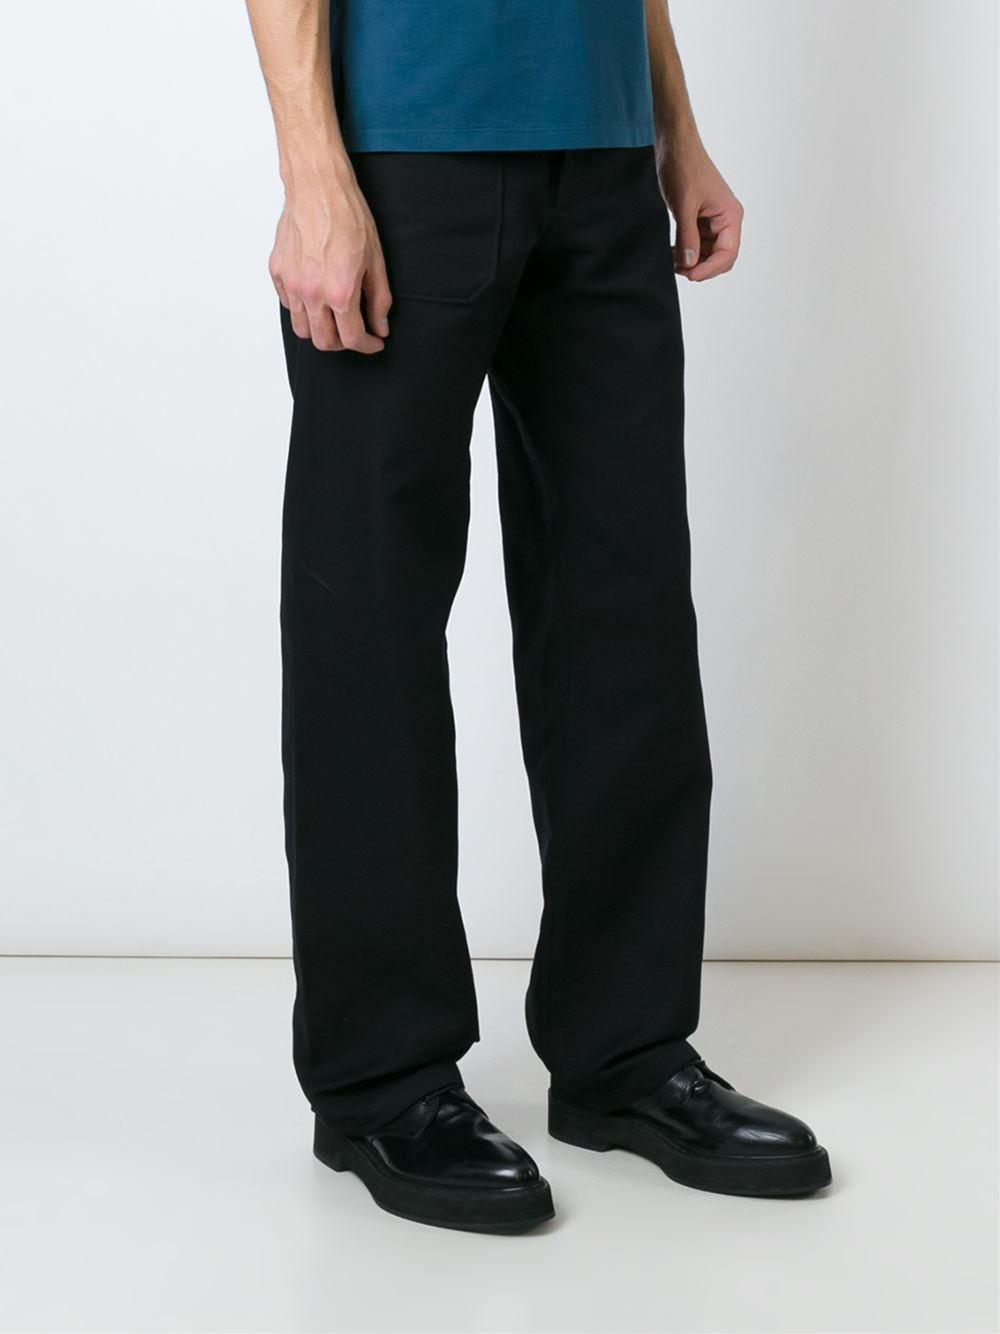 Lyst maison margiela wide leg trousers in black for men for 10 moulmein rise la maison